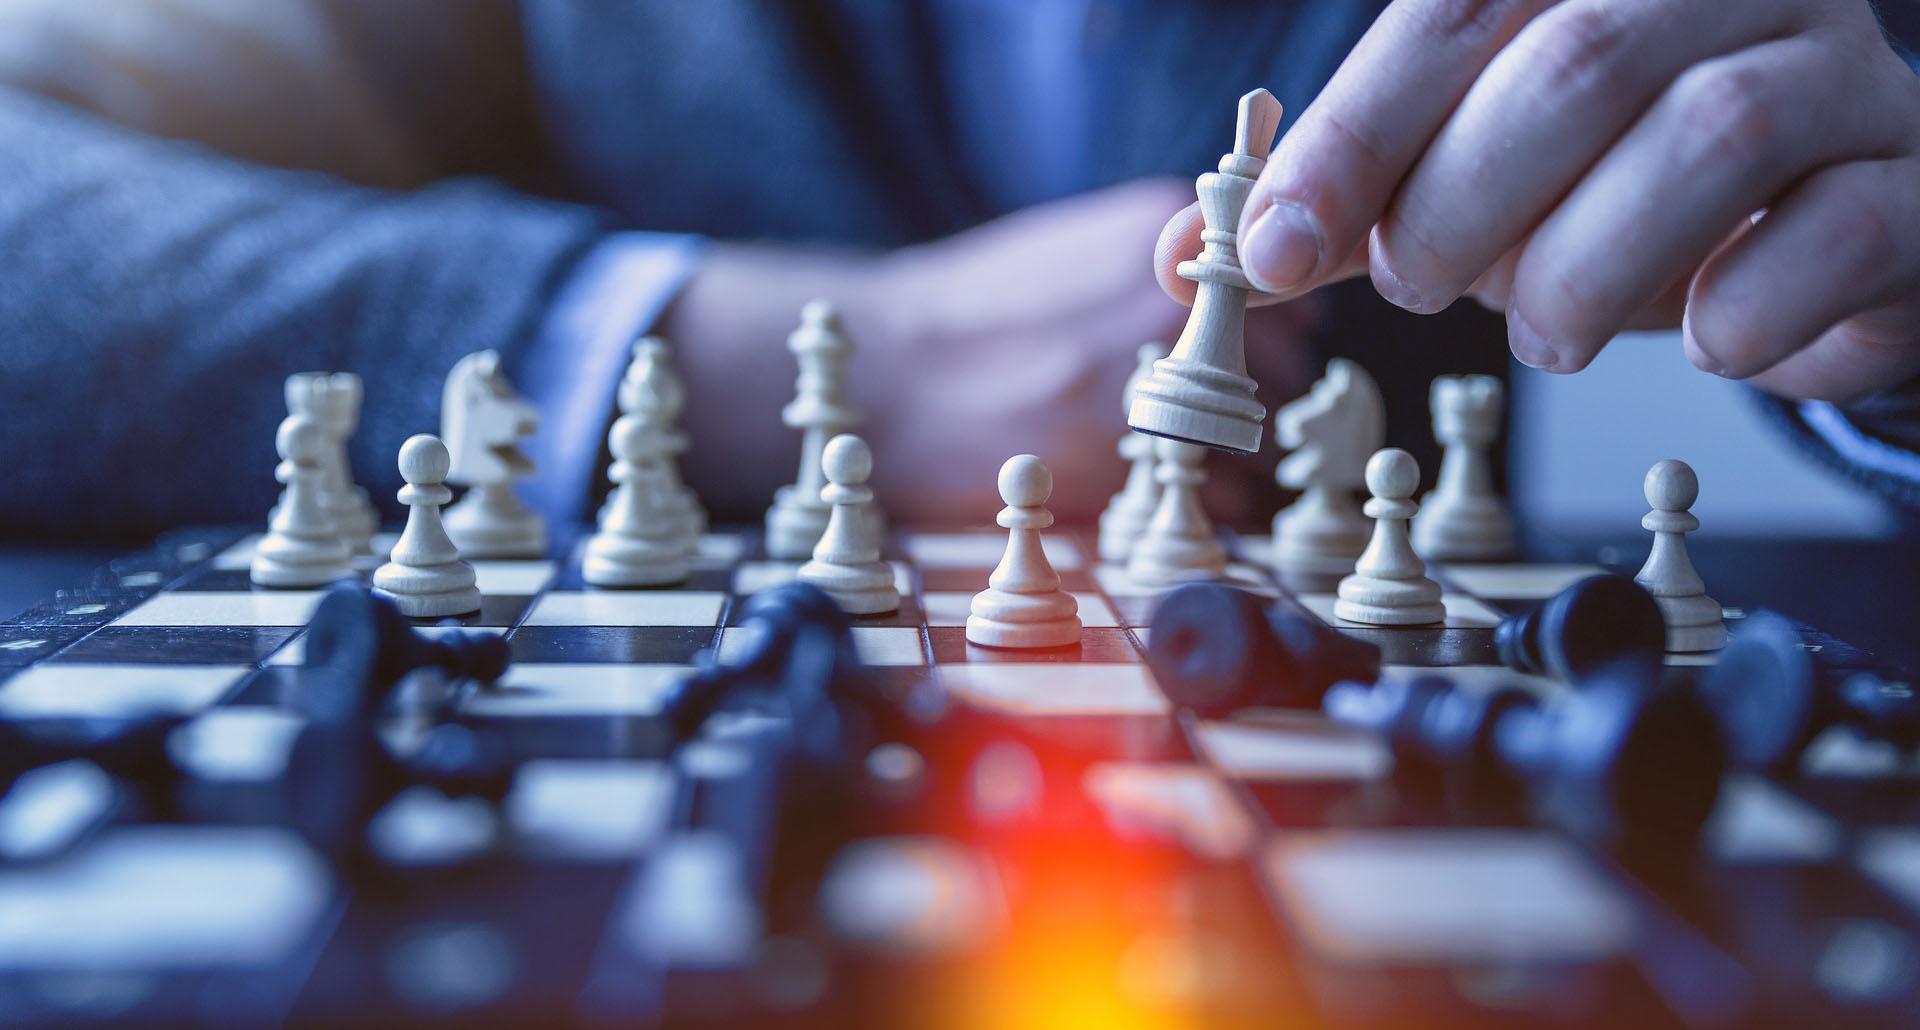 Capitalist Exploits - Chess game